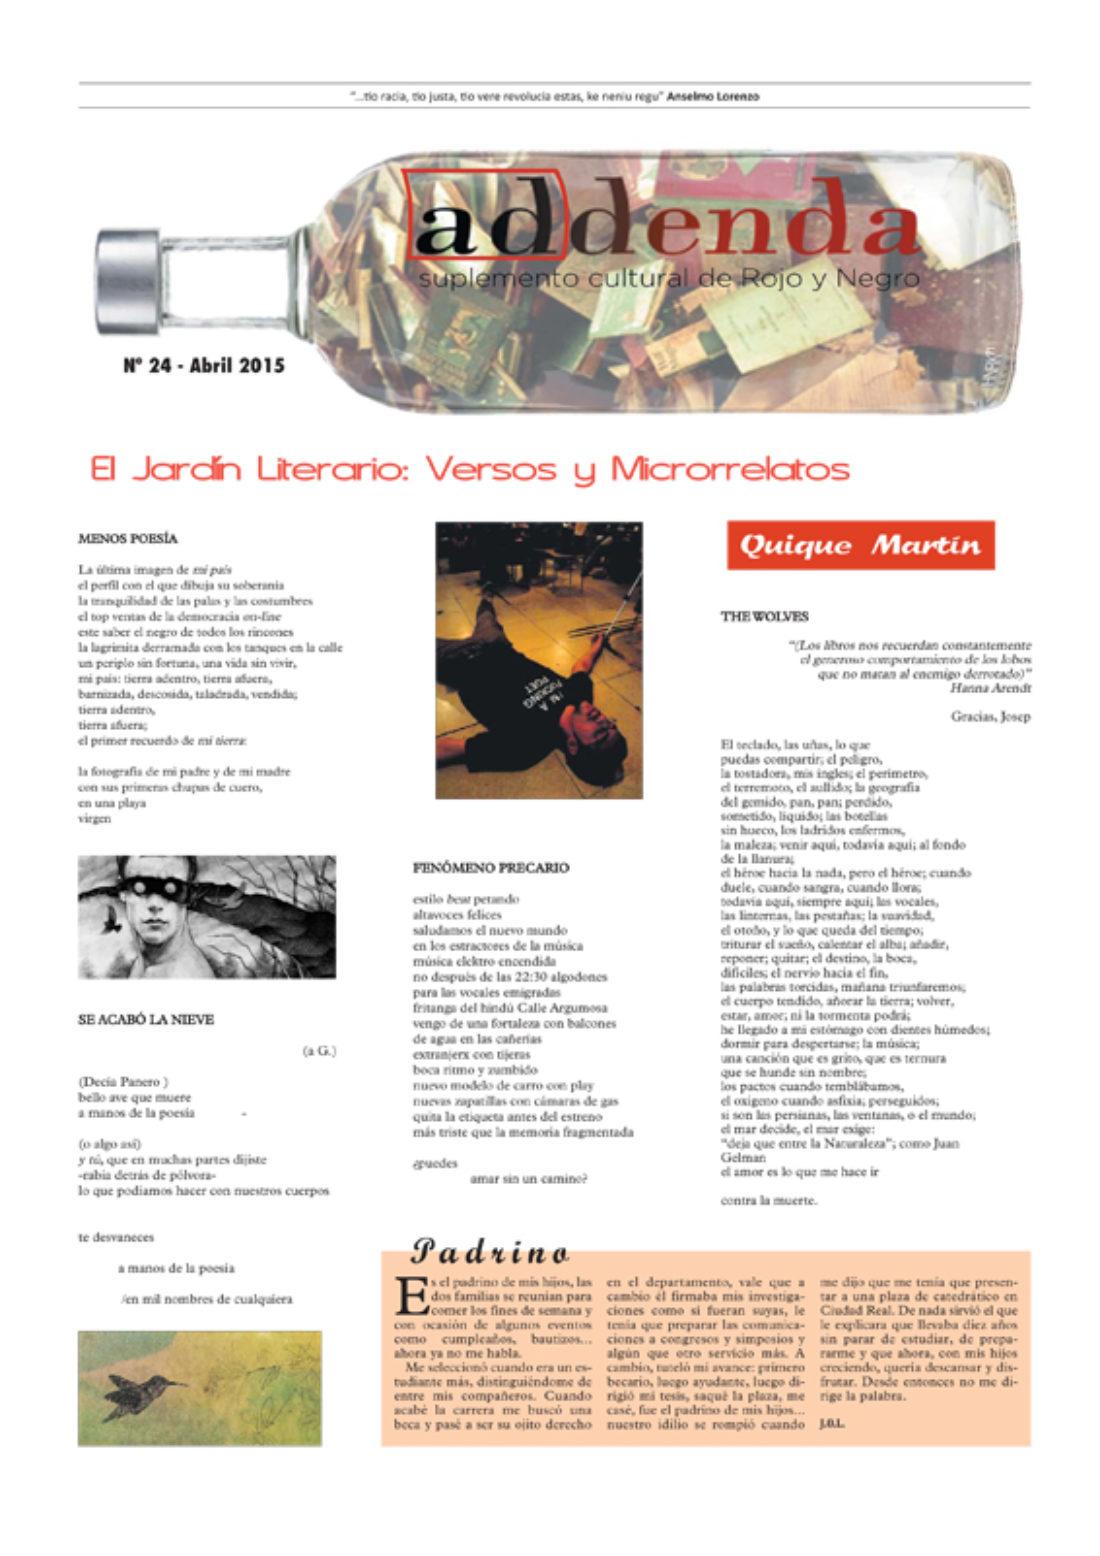 Addenda, suplemento cultural del RyN – Nº 24, abril 2015